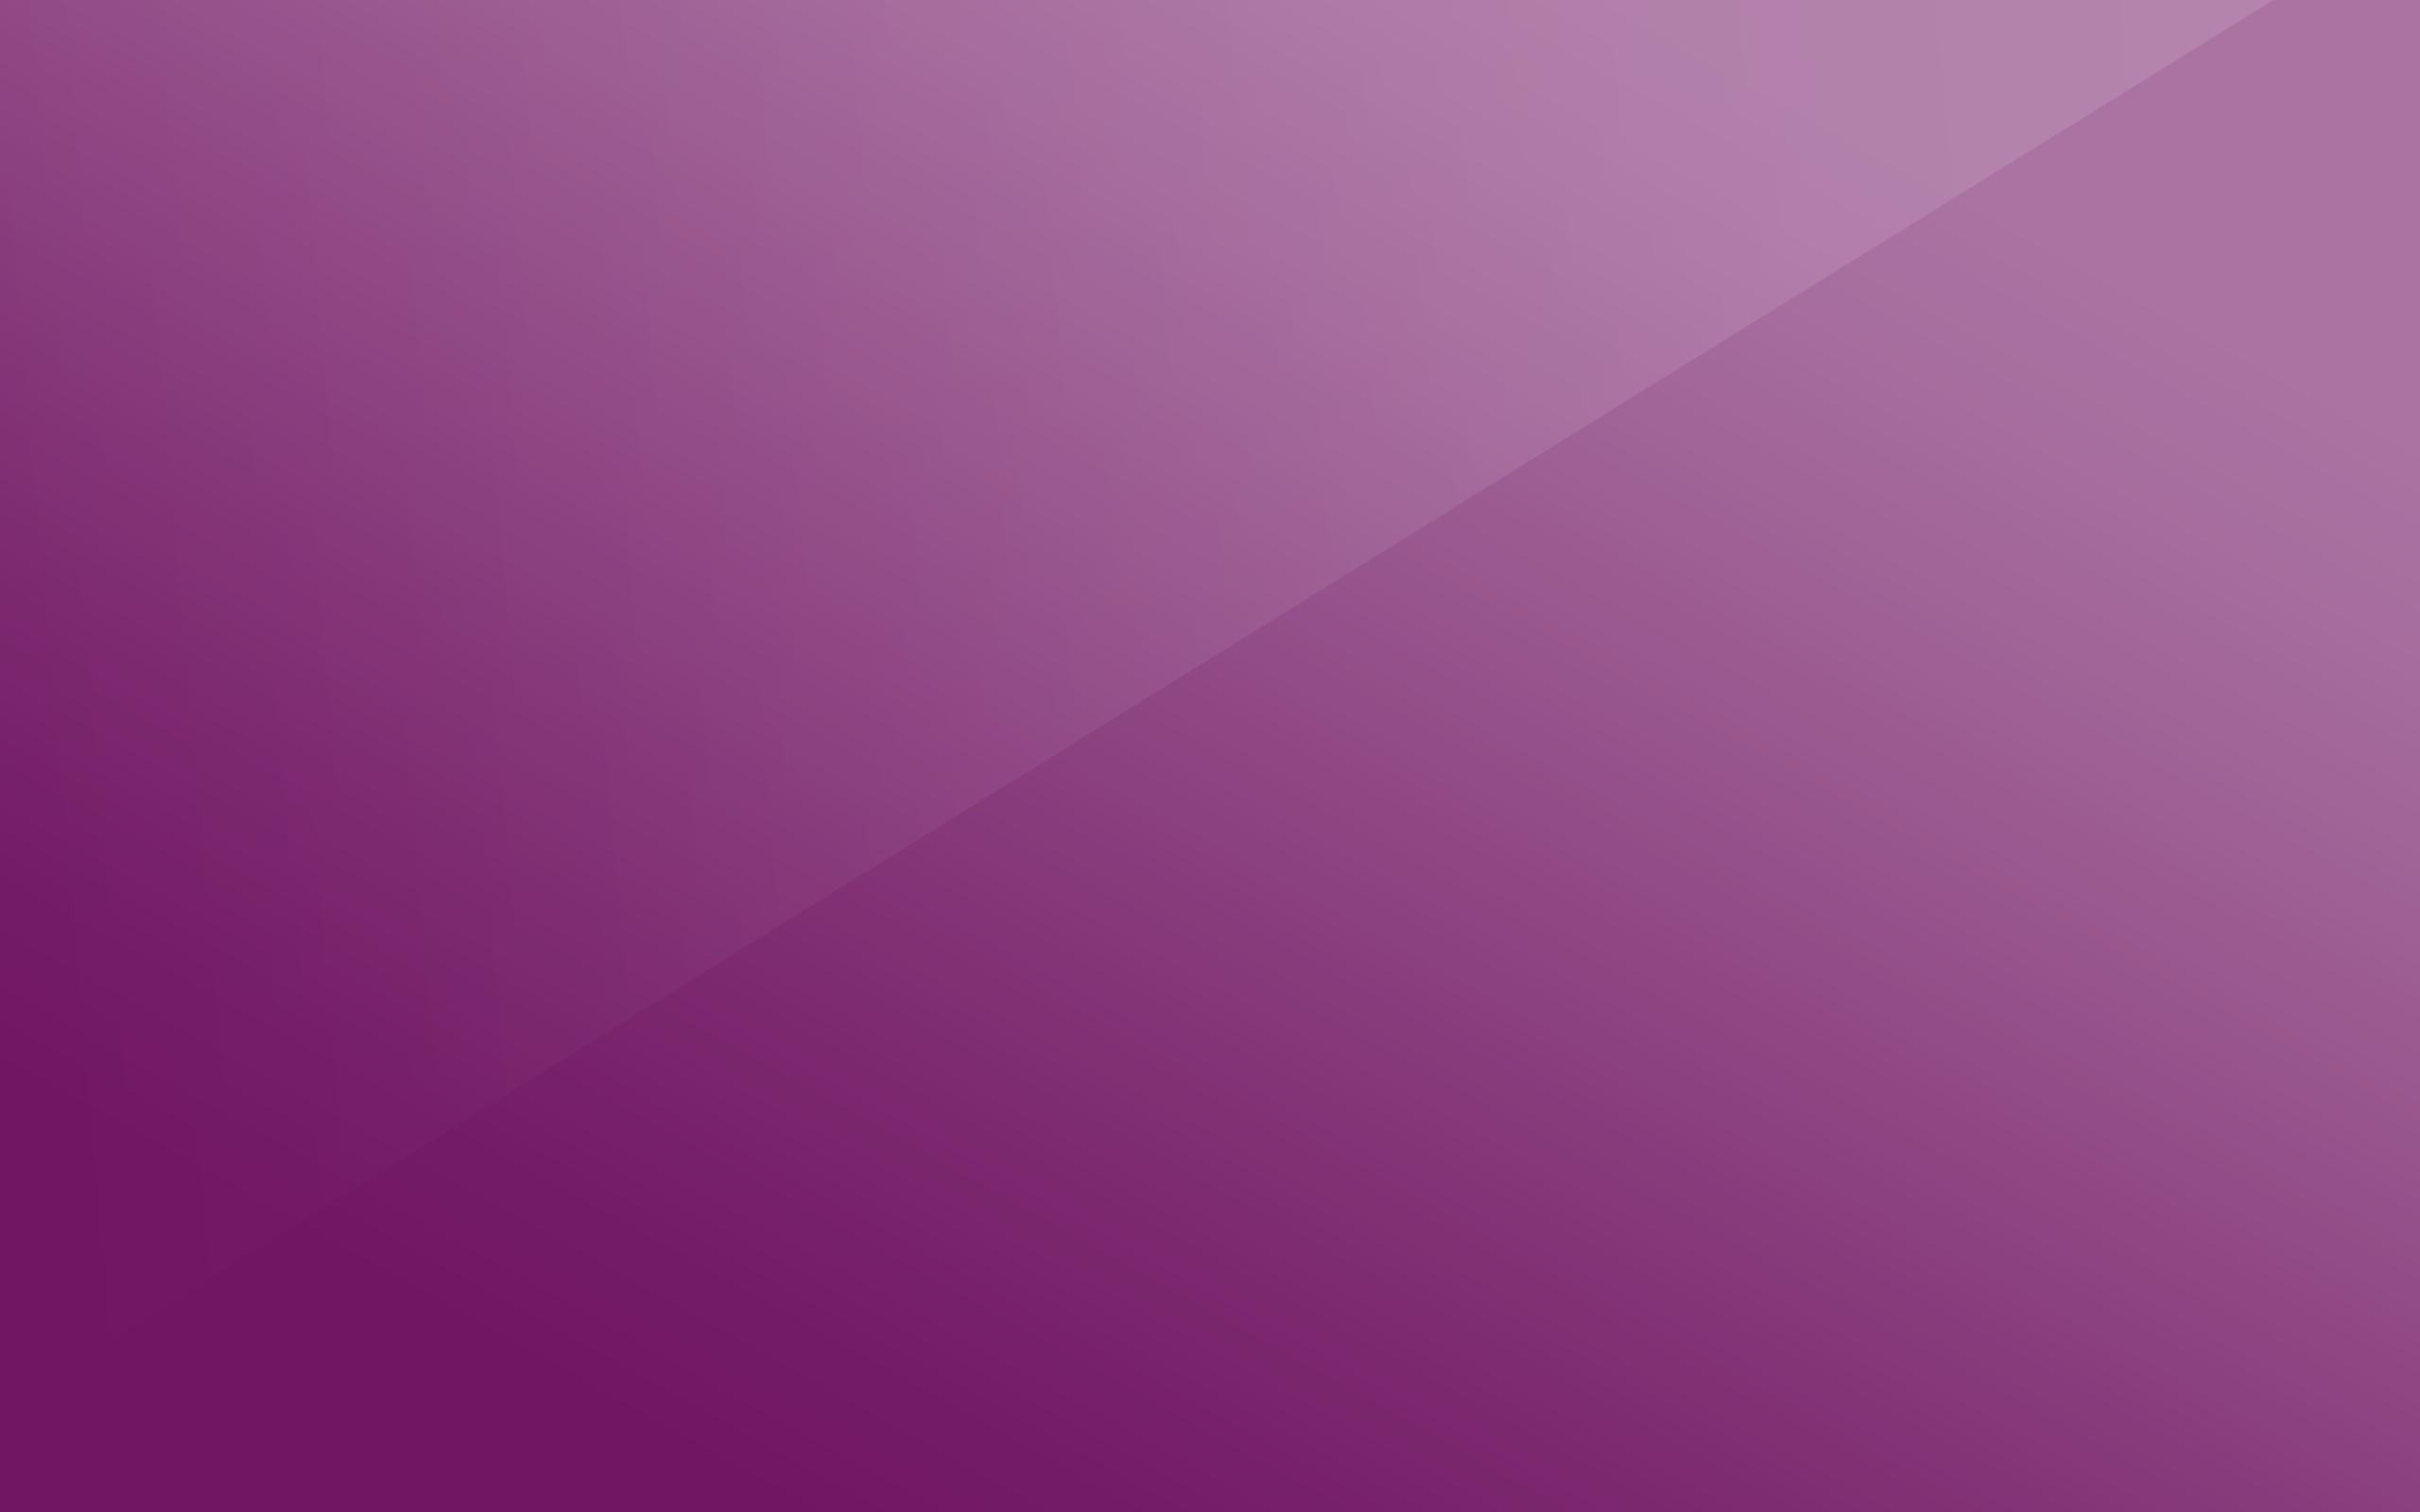 Light Purple Backgrounds wallpaper wallpaper hd background desktop 2560x1600